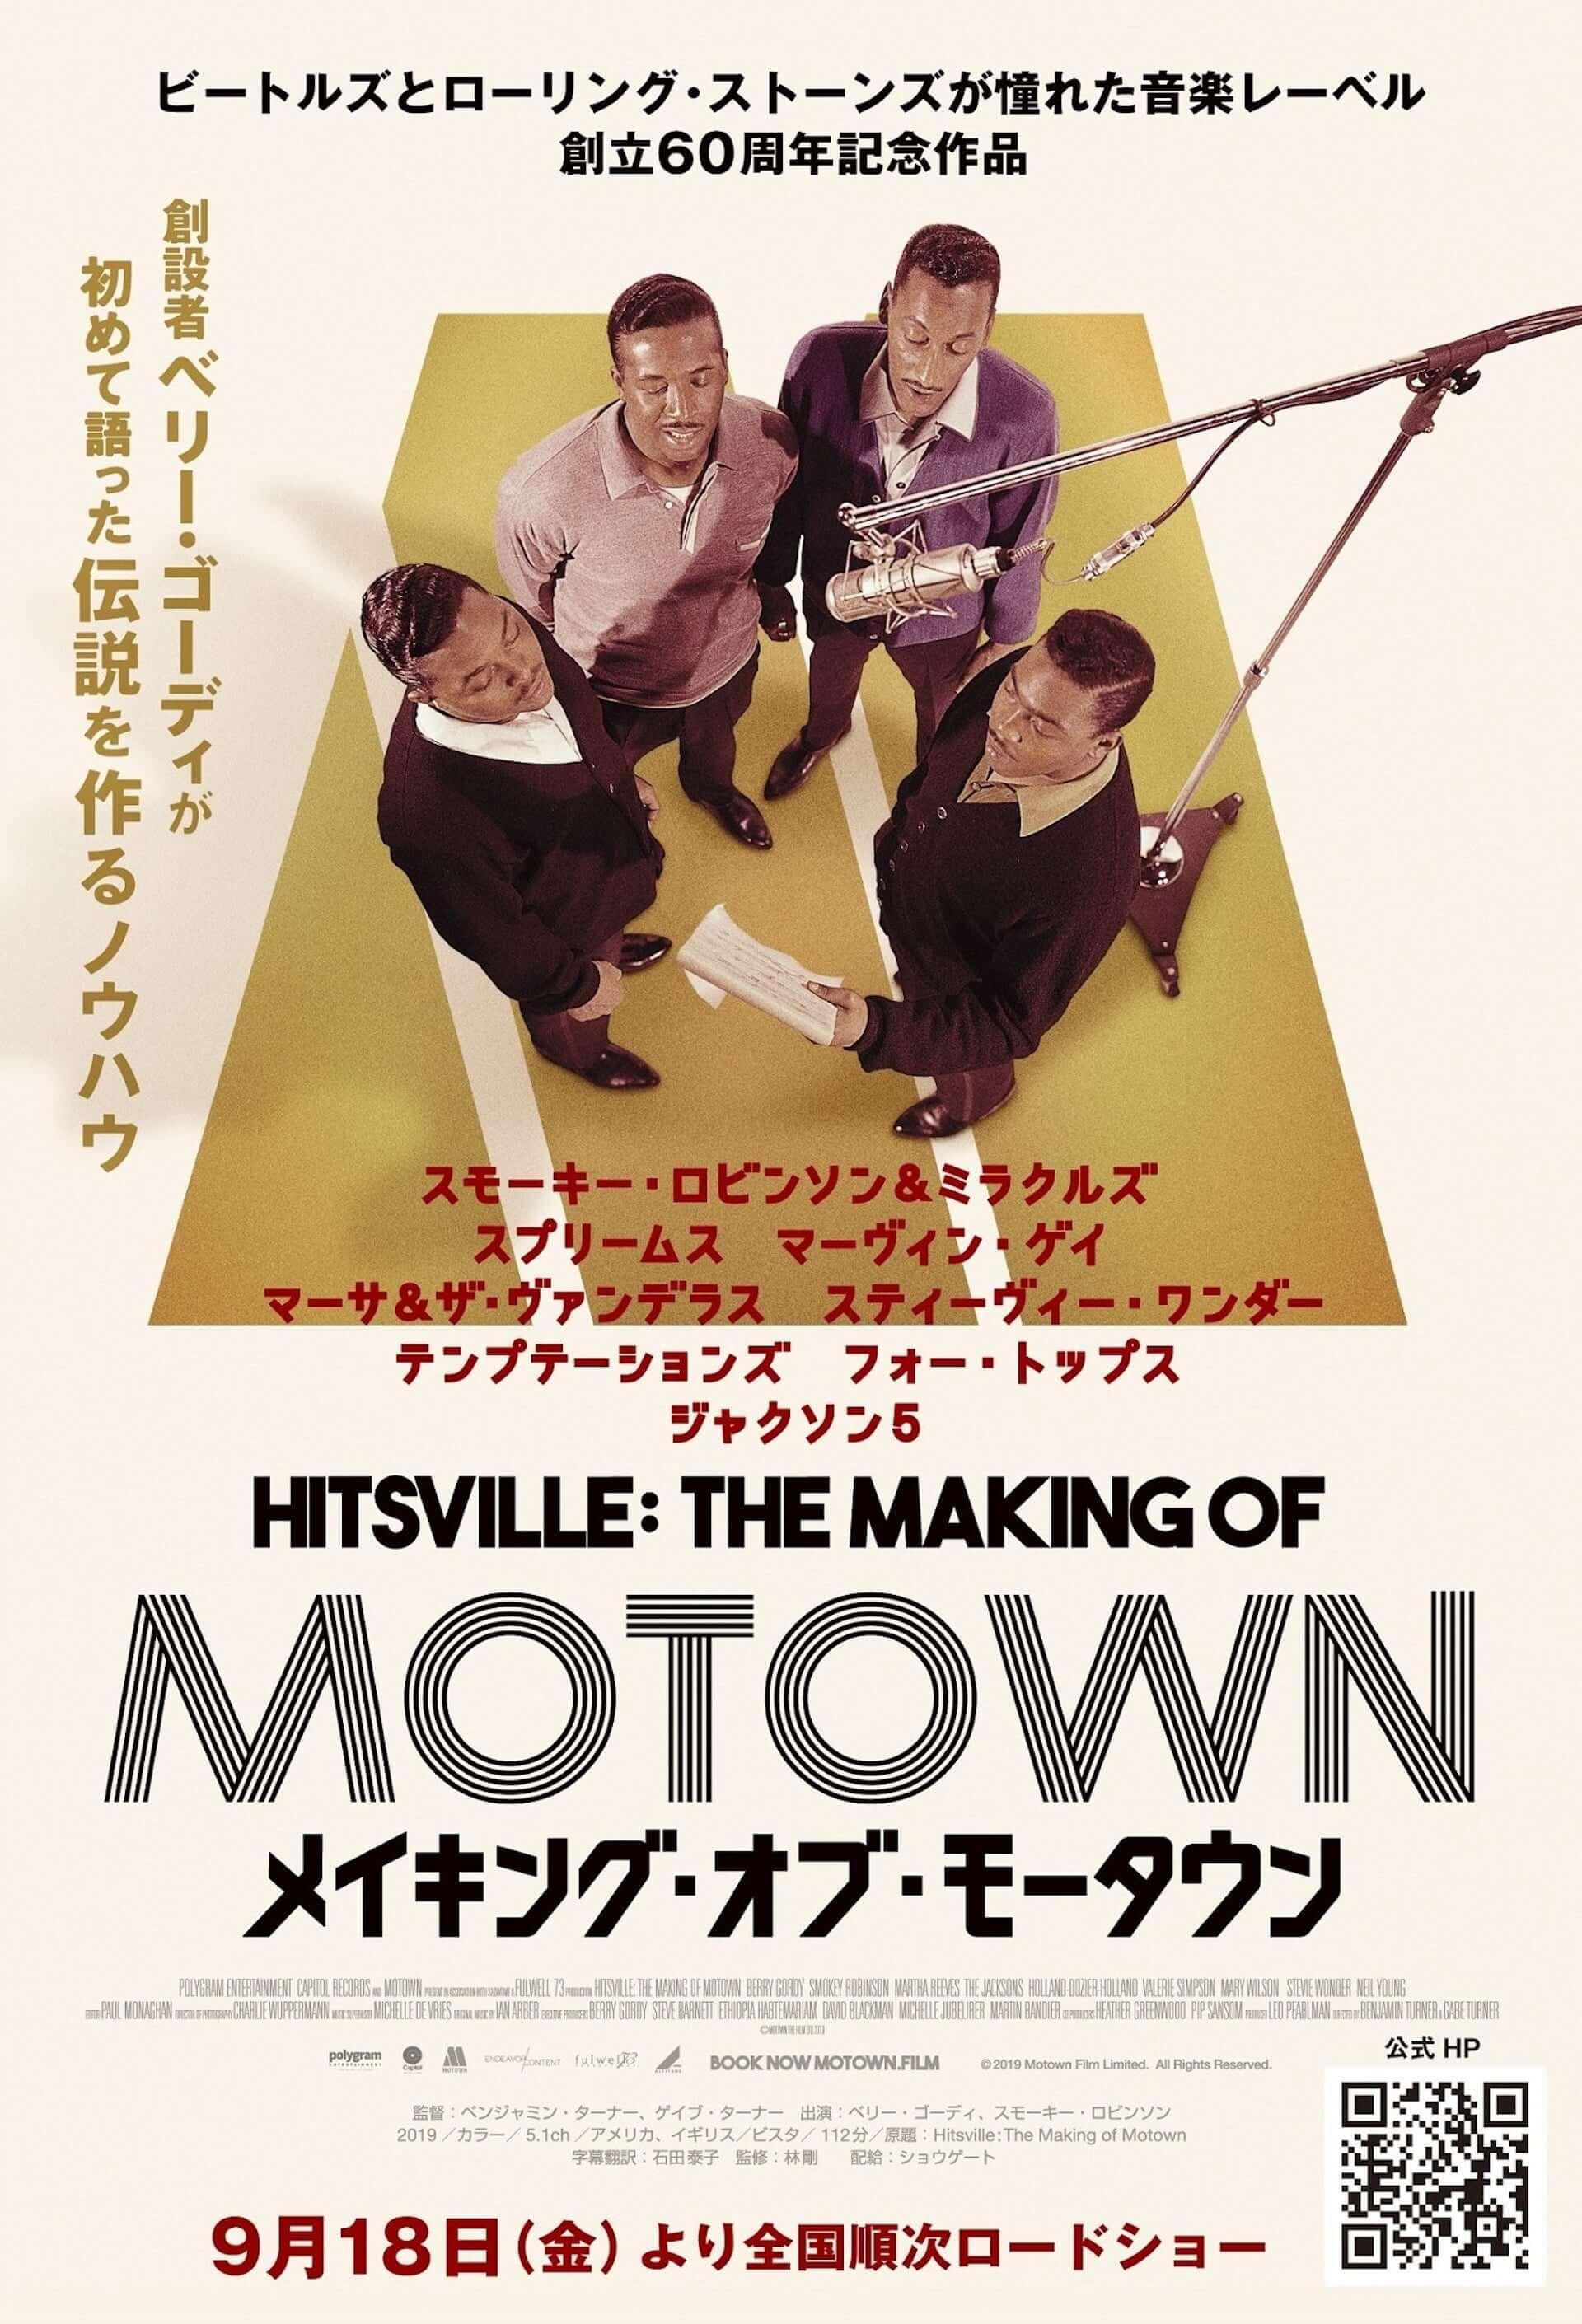 RHYMESTER・DJ JINが映画『メイキング・オブ・モータウン』の魅力を語る!ギンザレコード主催イベントのレポートが到着 film200908_makingofmotown_1-1920x2821